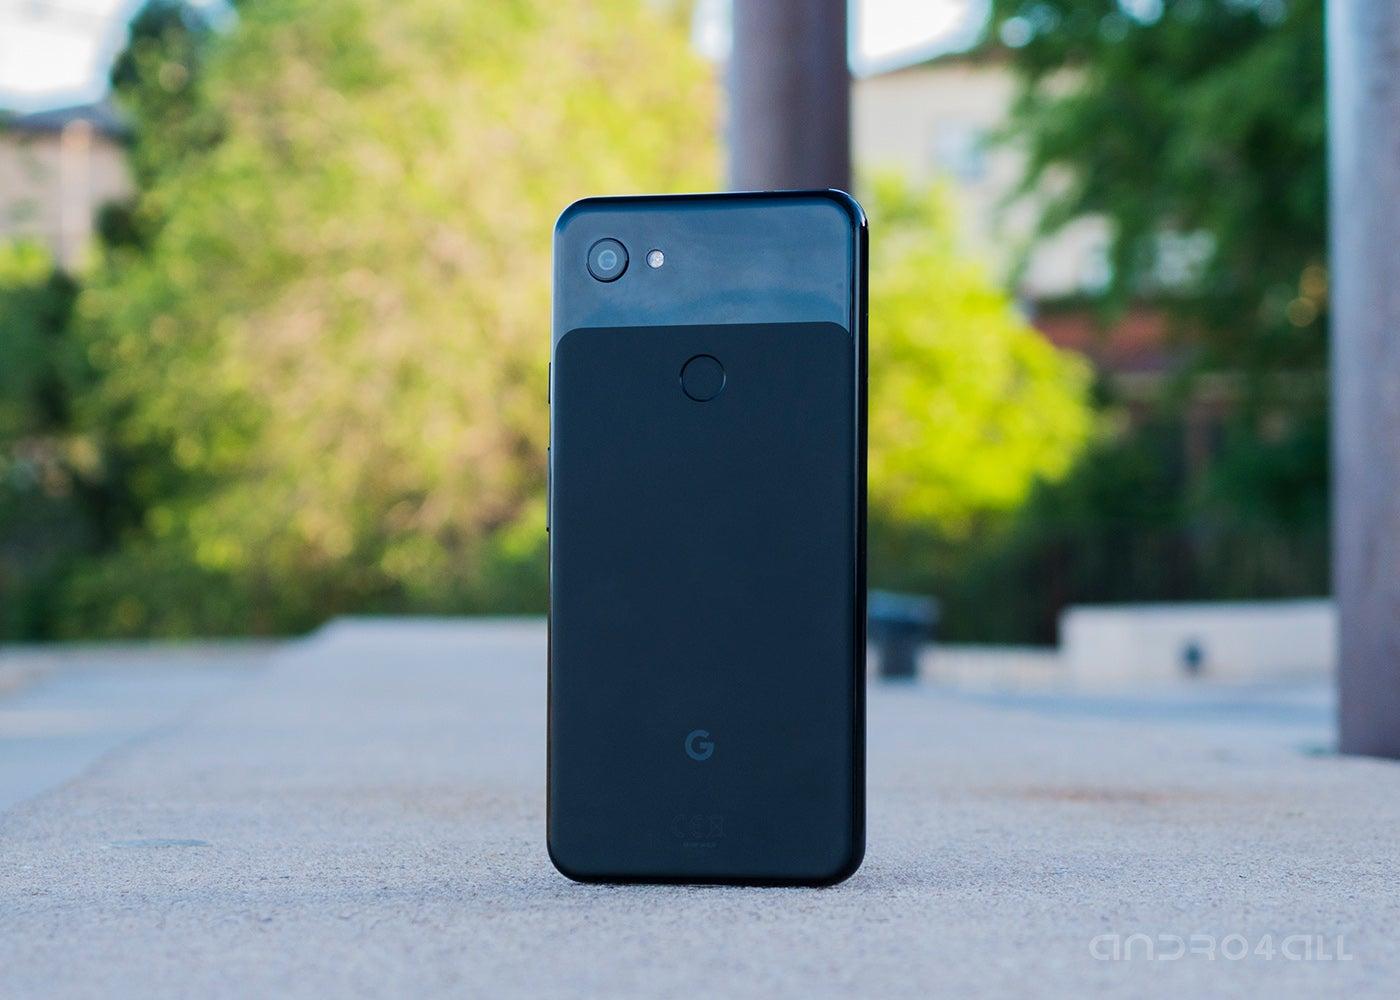 GOogle Pixel 3a XL, black back